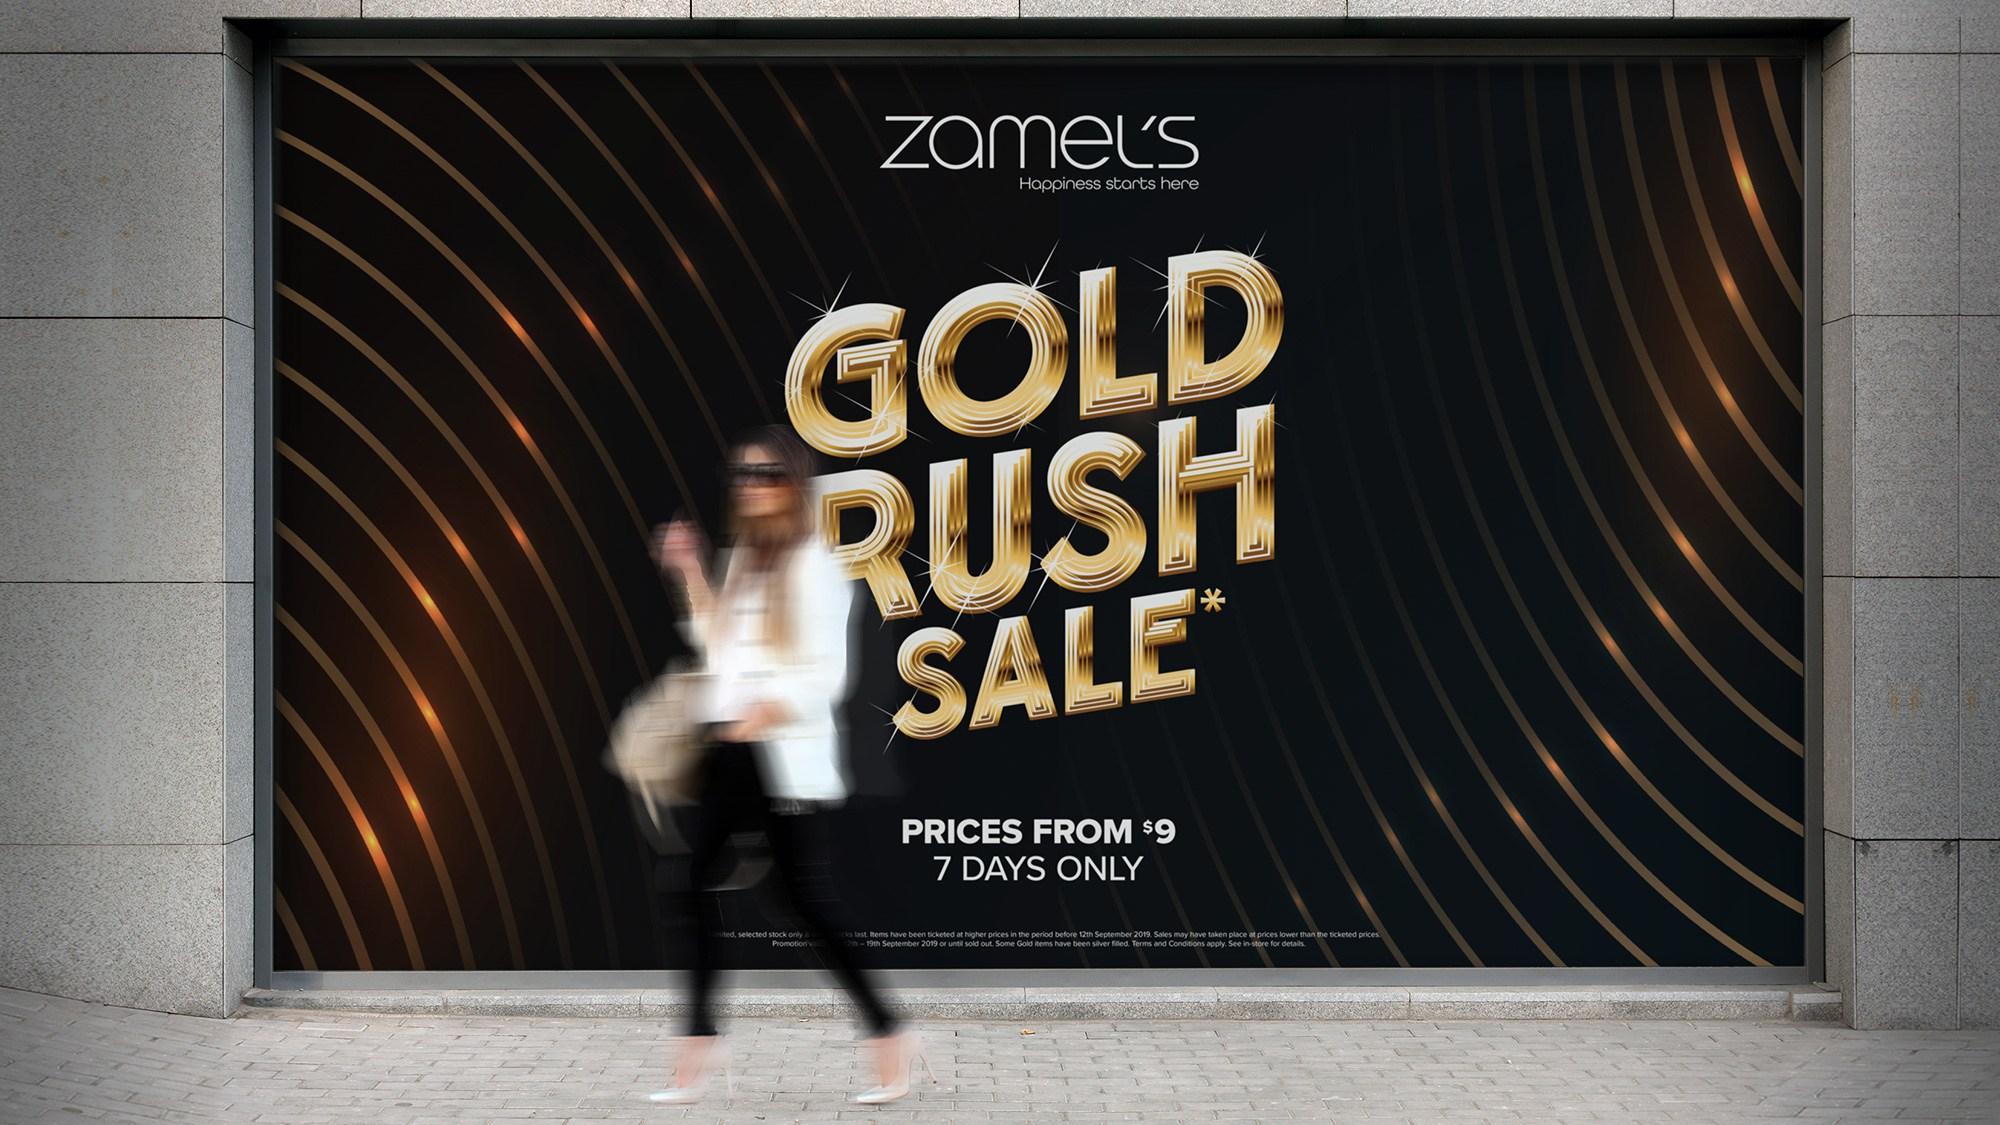 Zamel's Jewellers Gold Rush Advertising Outdoor Window Decal